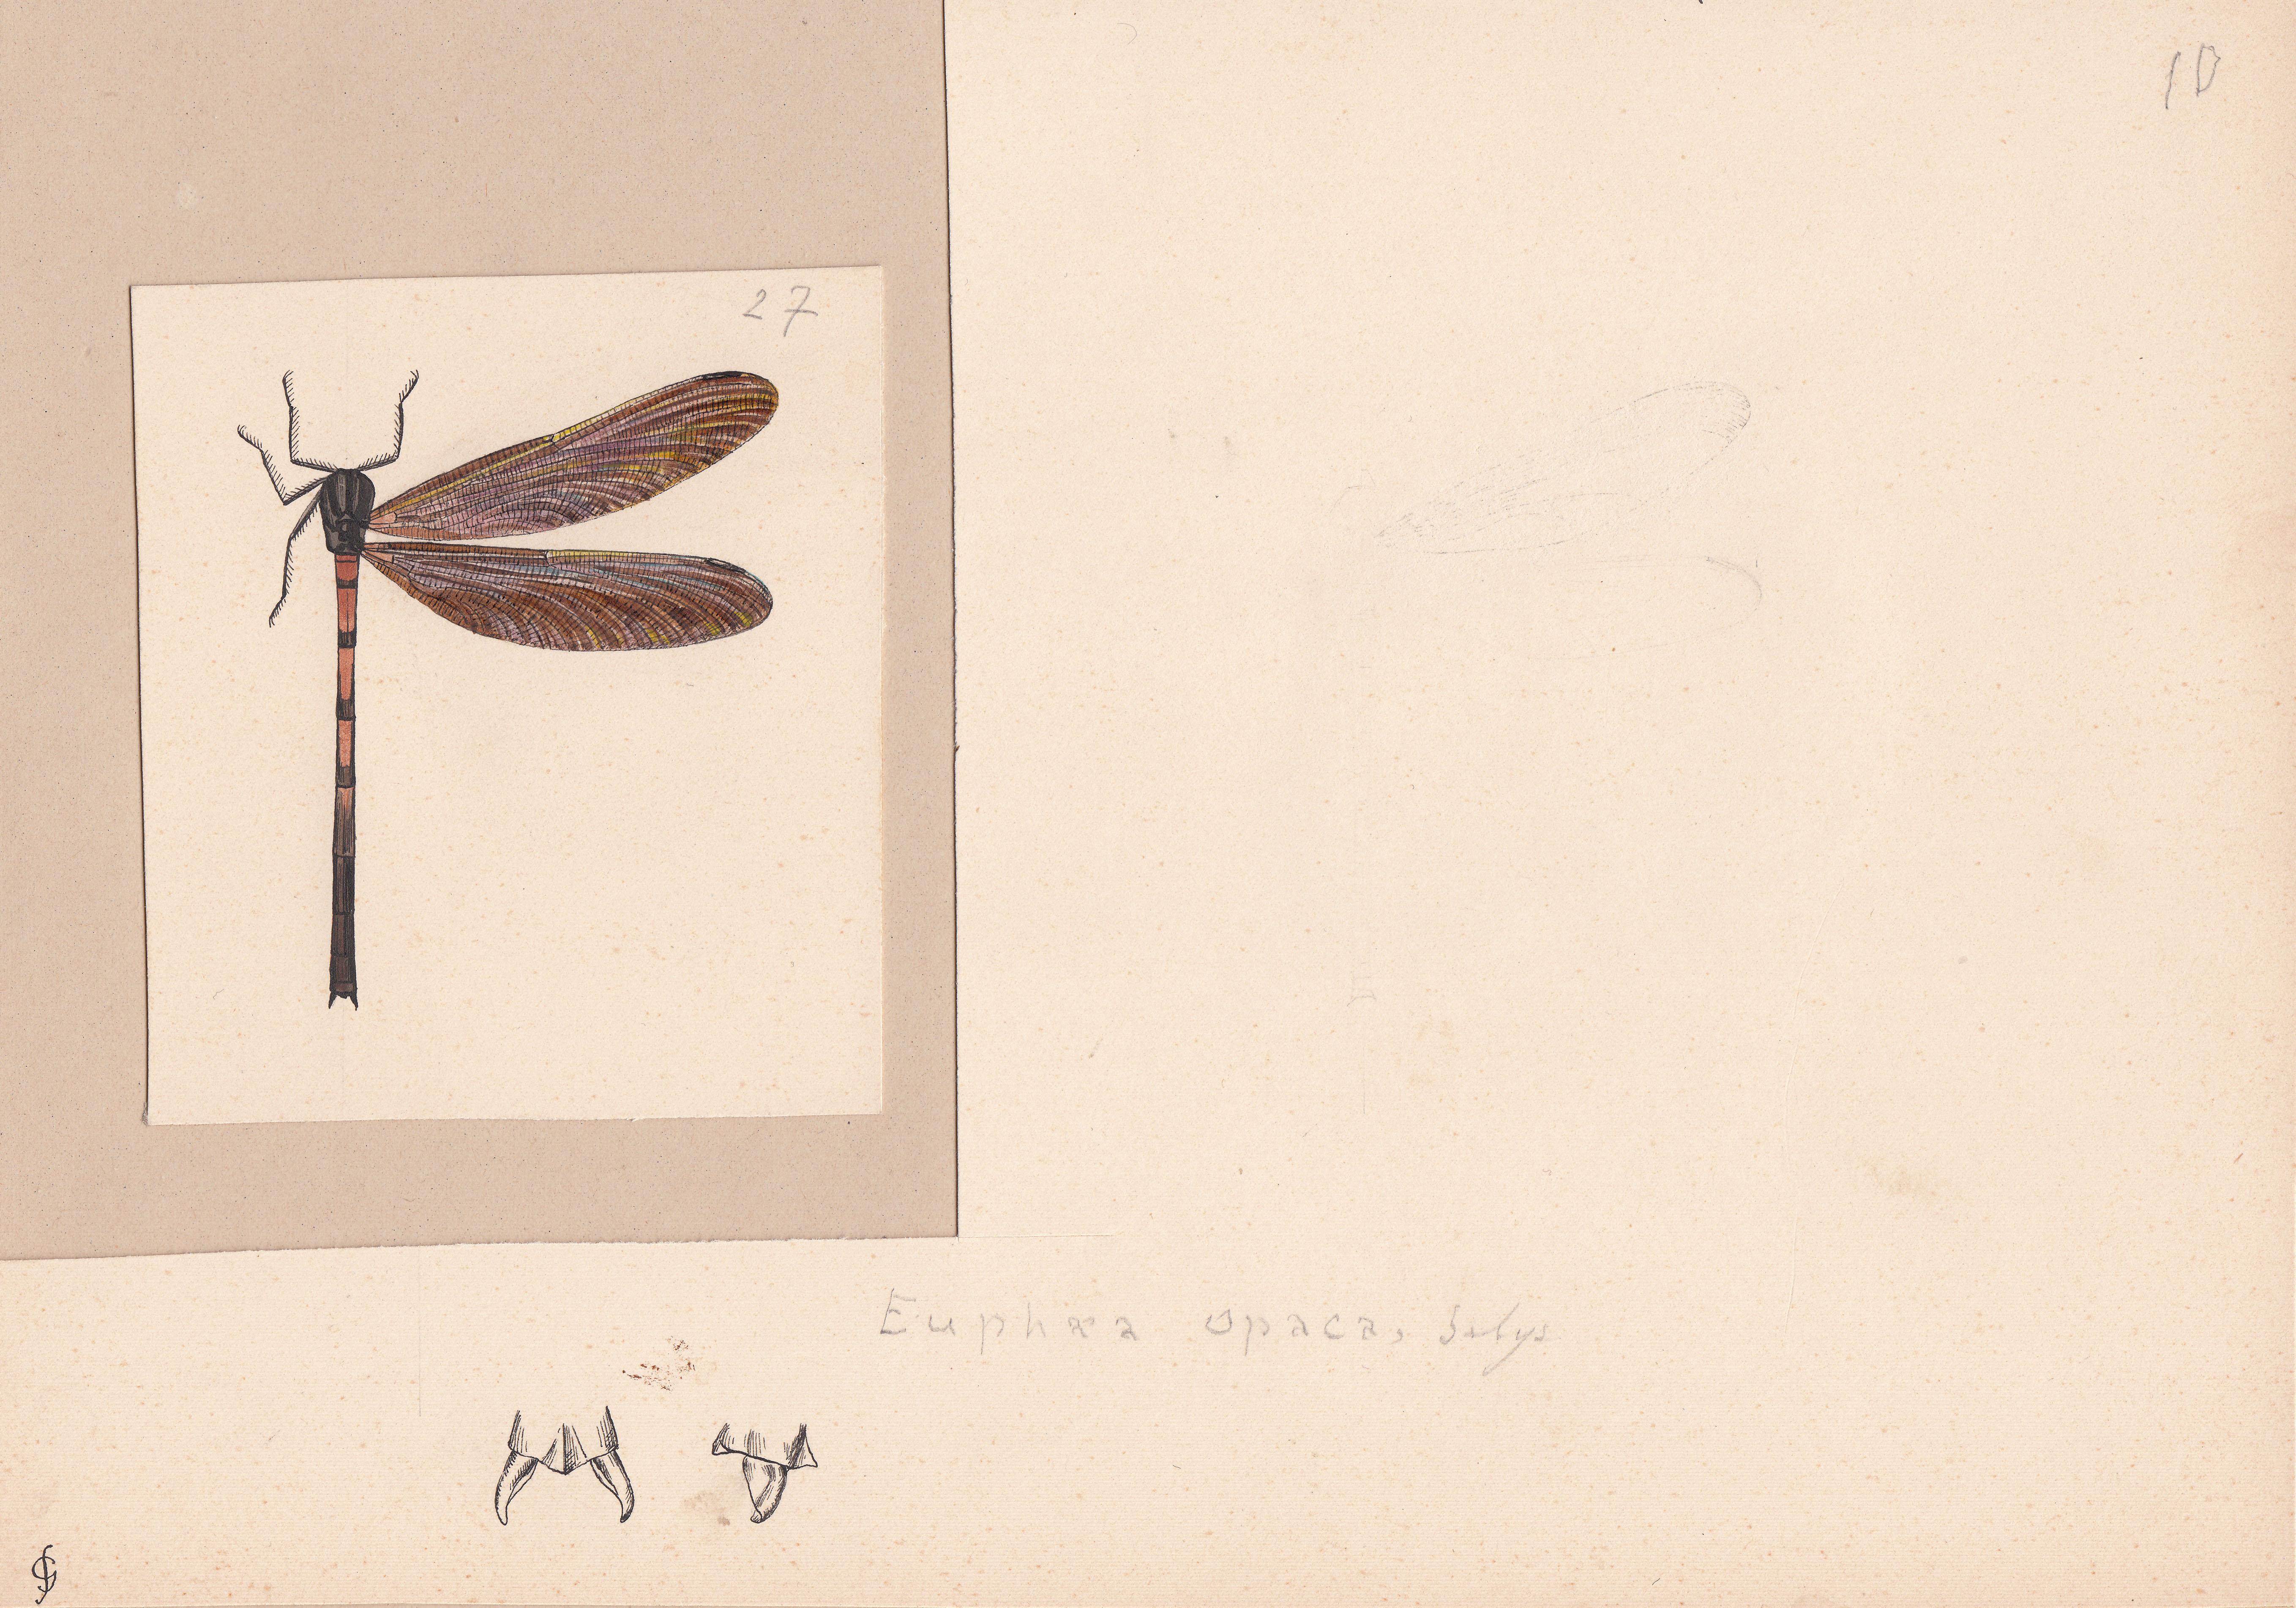 Euphaea opaca.jpg